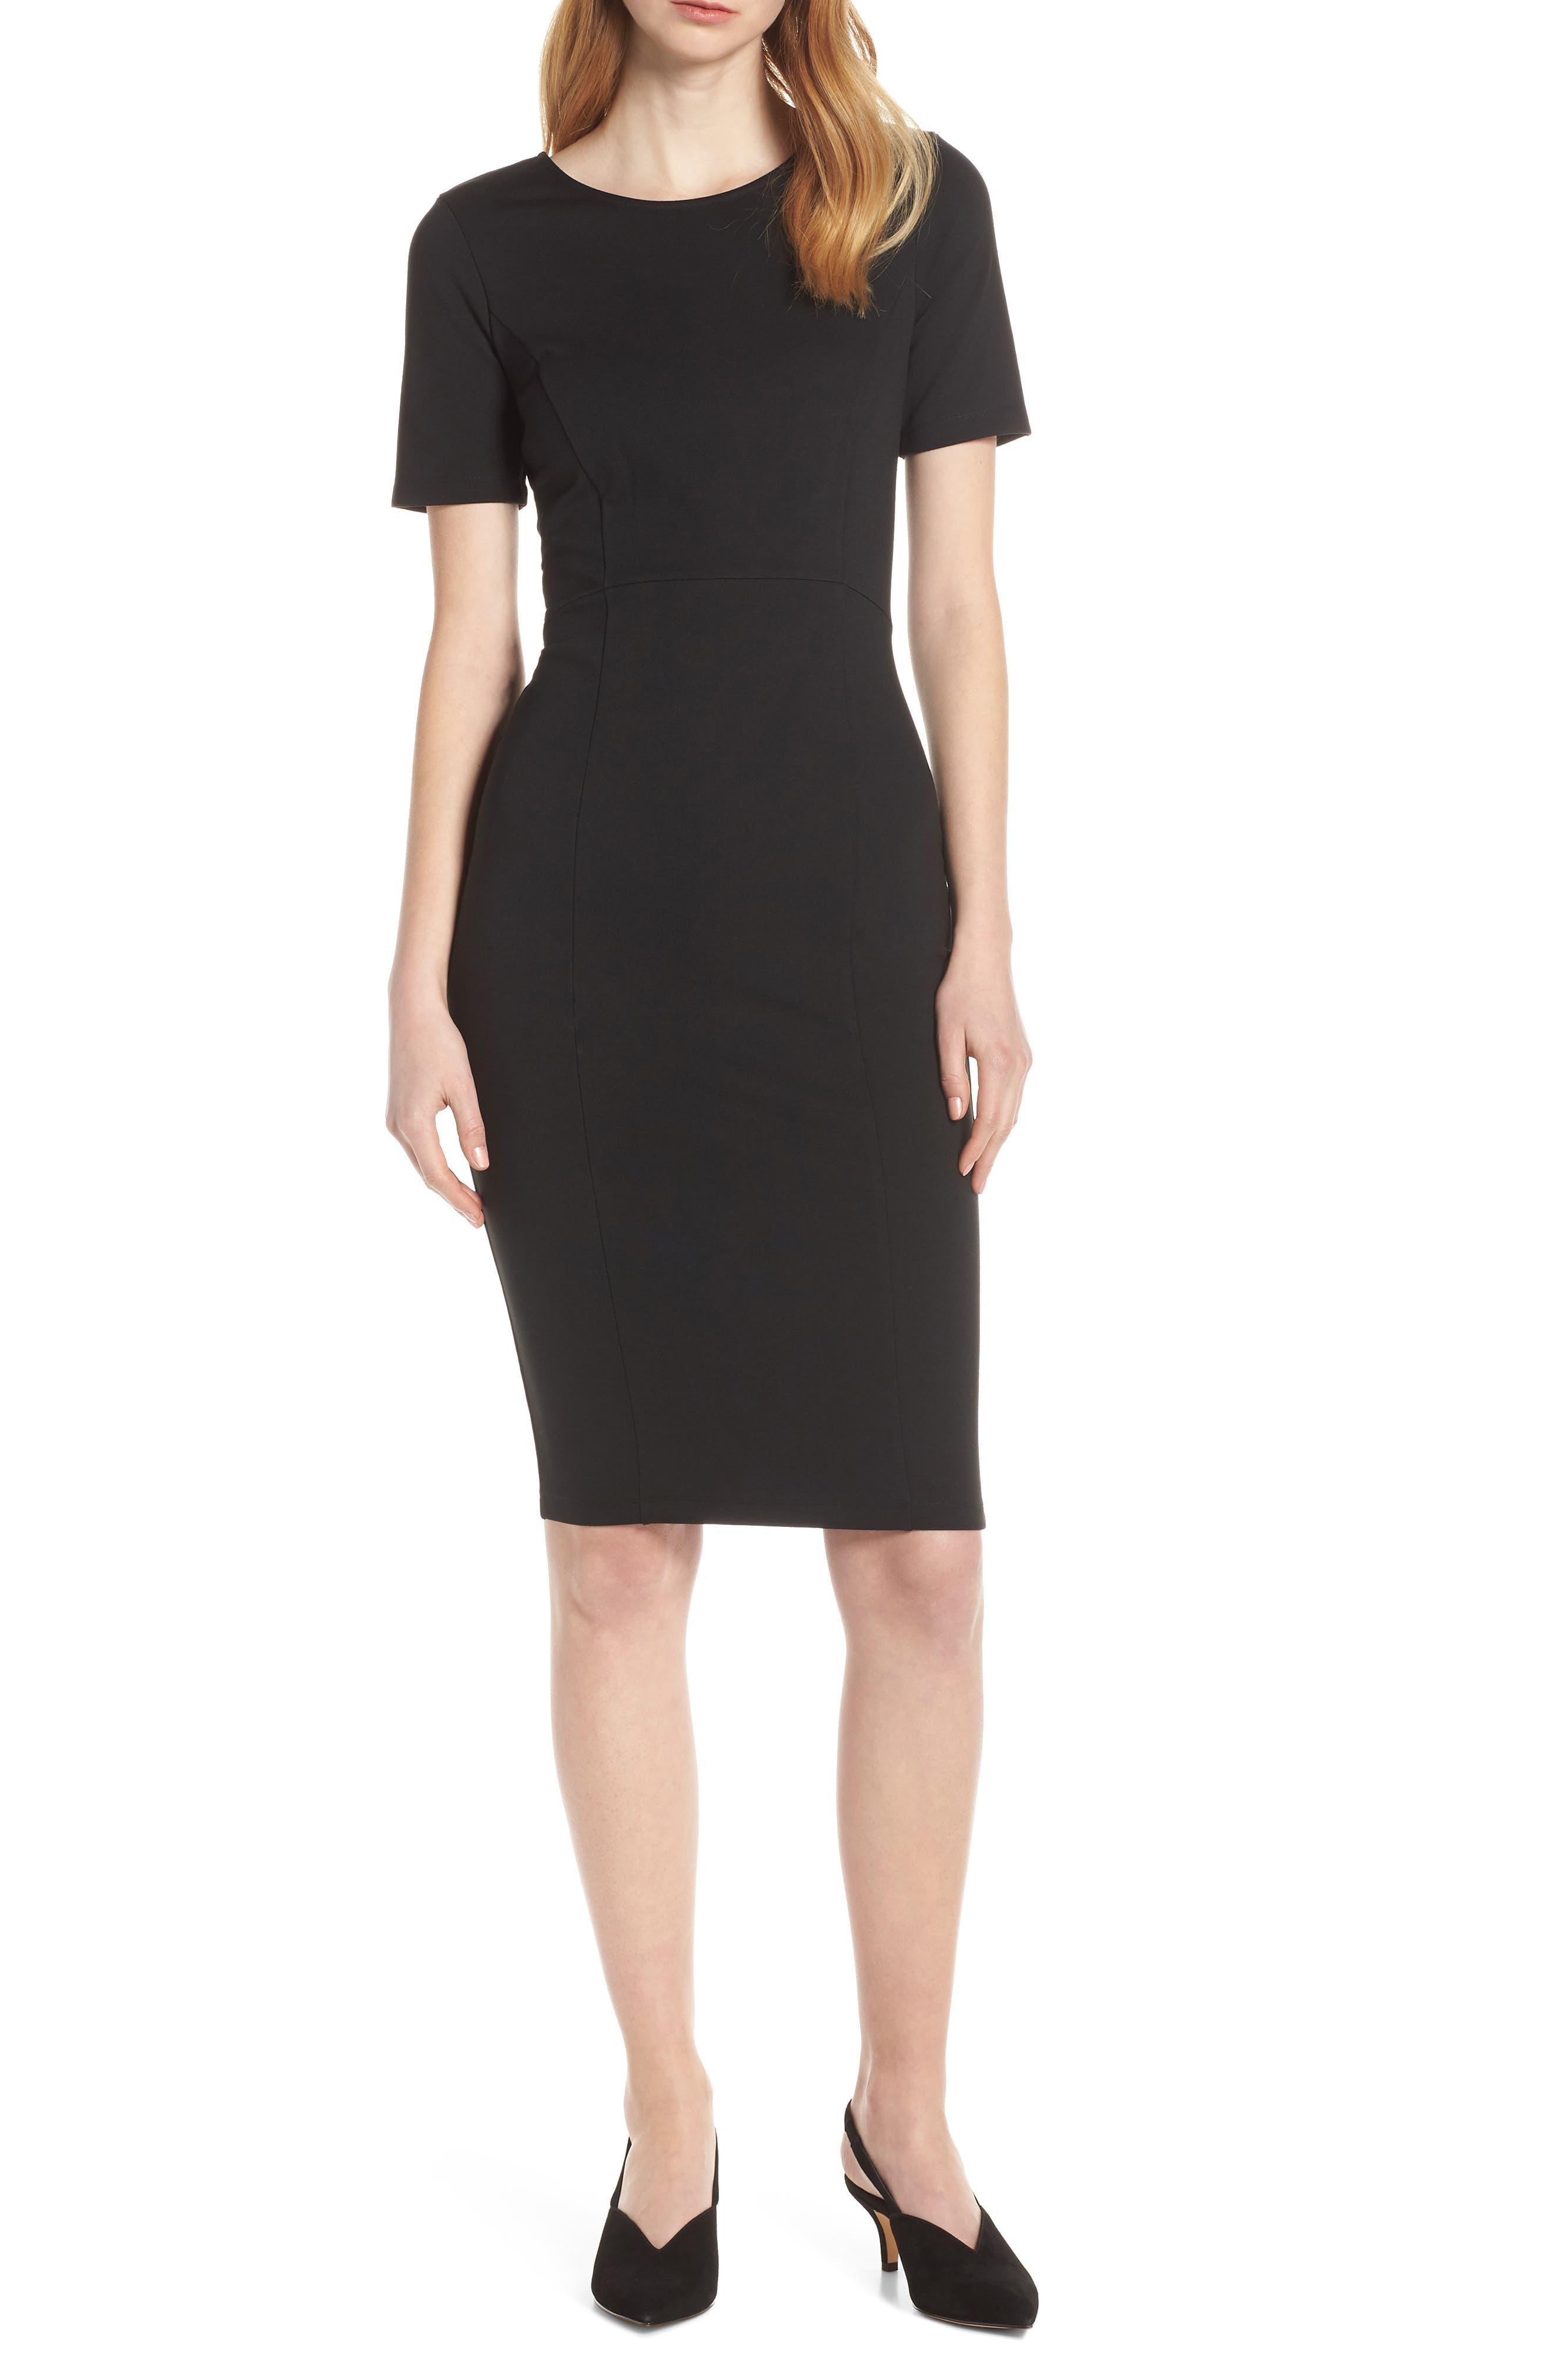 ALI & JAY, Zip Back Sheath Dress, Alternate thumbnail 2, color, BLACK